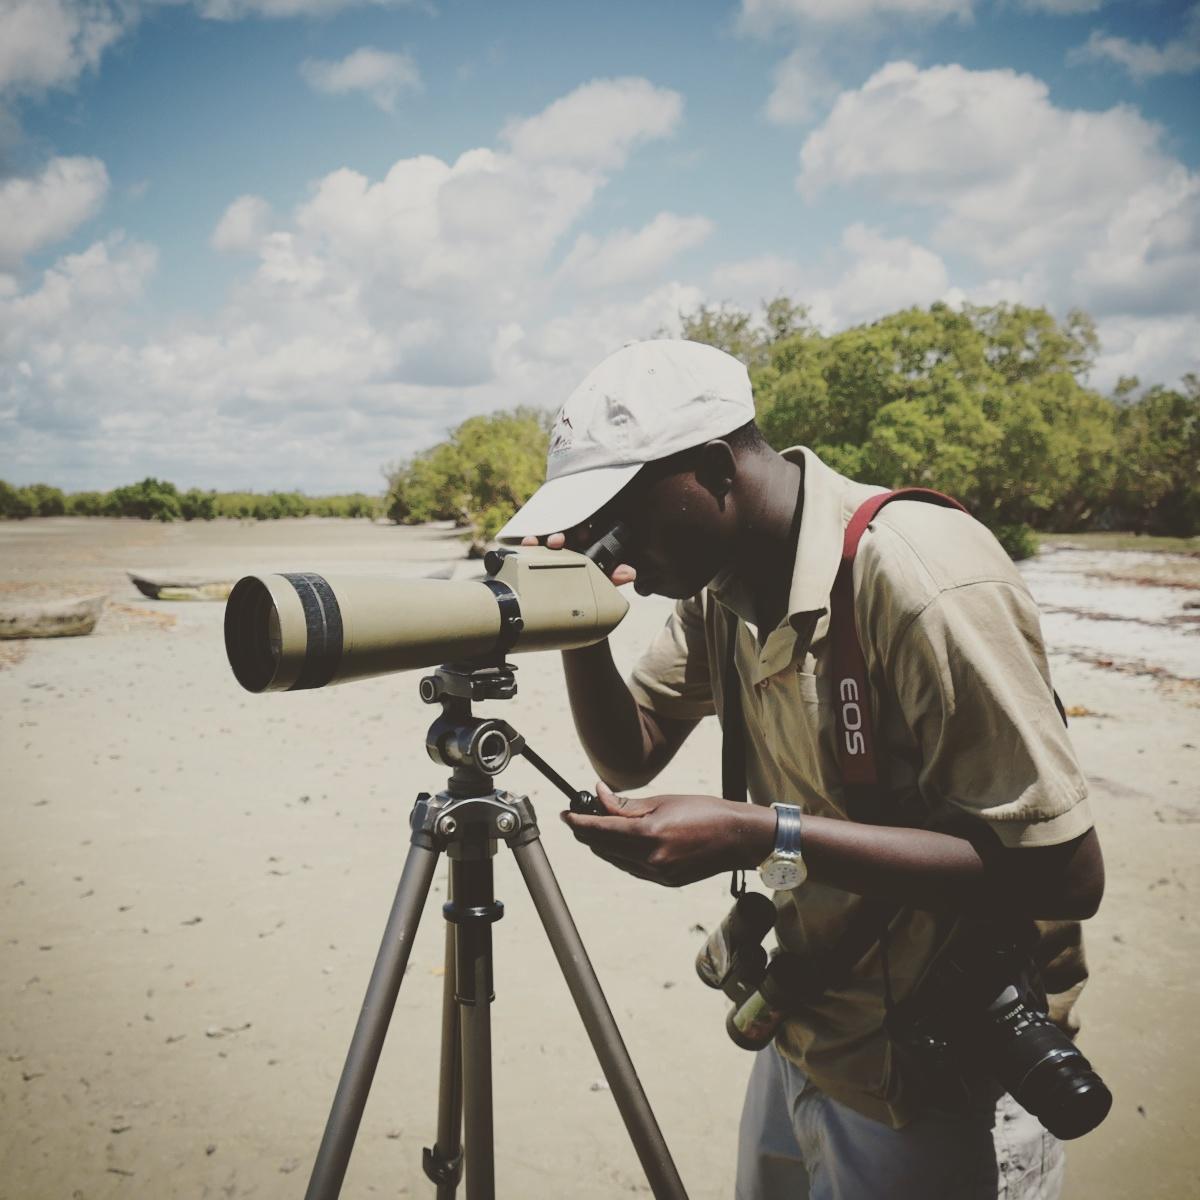 Joe Aengwo looks for birds along the Kenyan coast before flying back to Nairobi. Noah Strycker